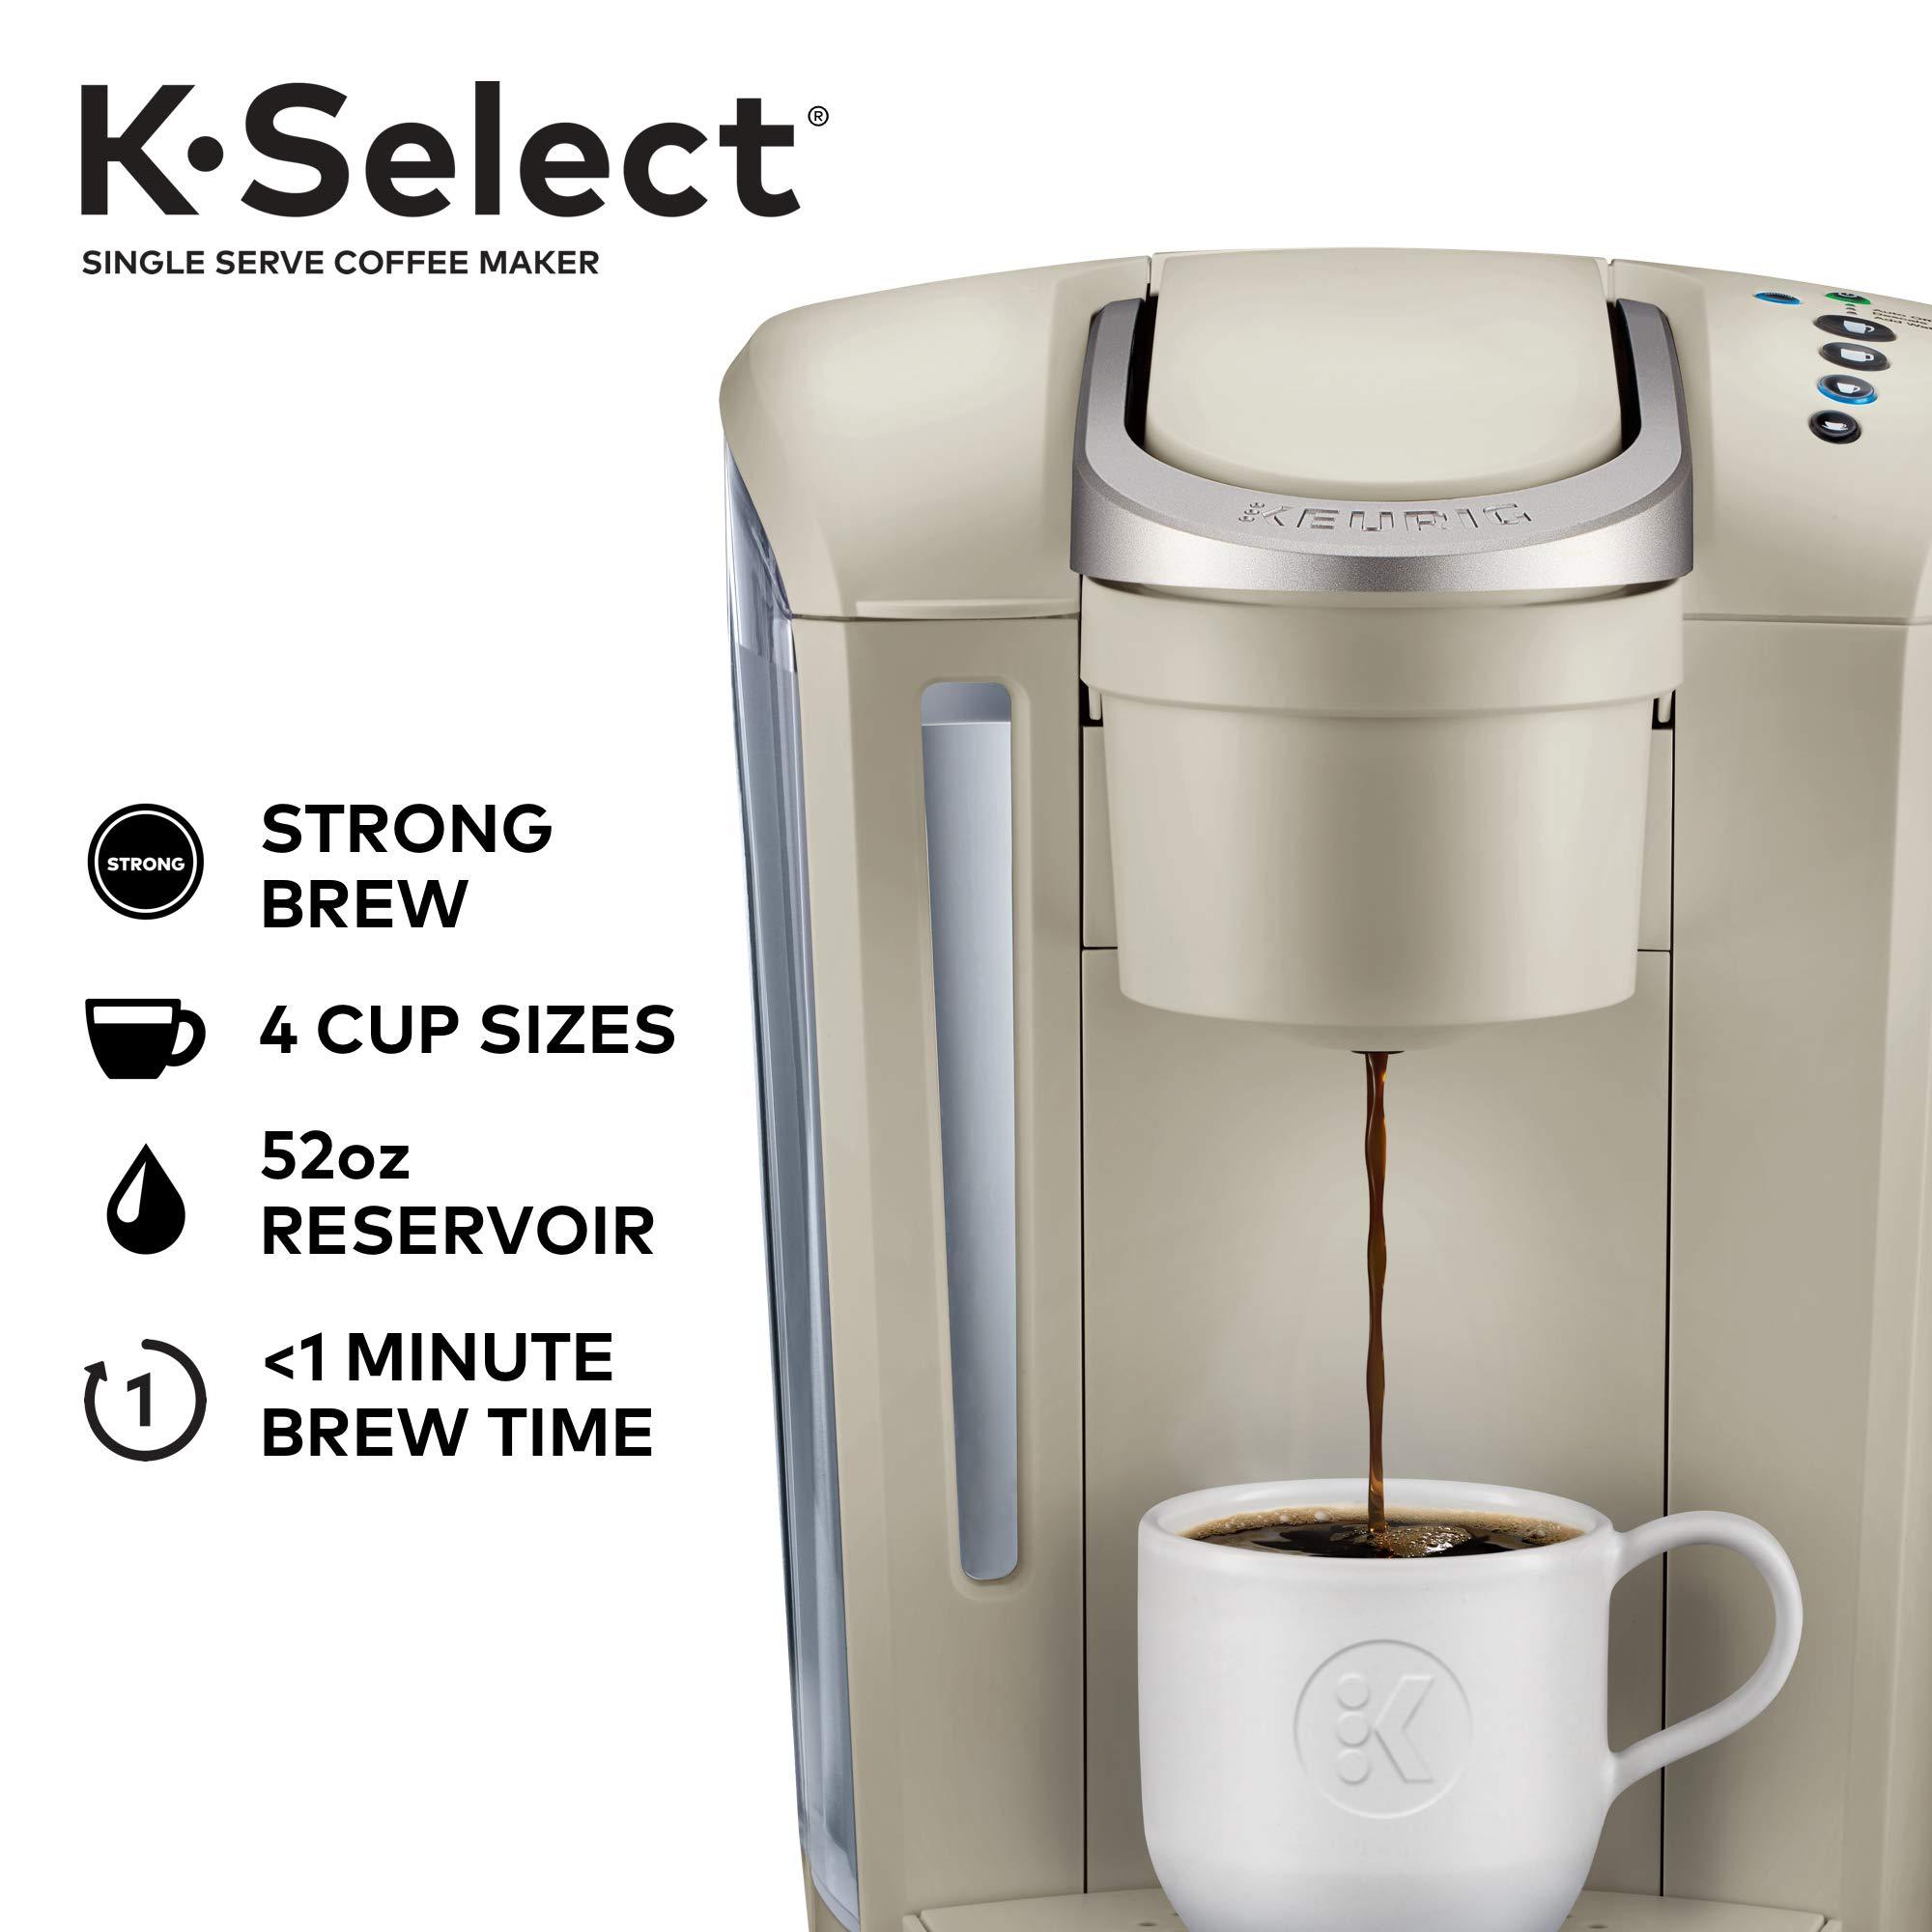 Keurig K-Select Single-Serve K-Cup Pod Coffee Maker, Sandstone by Keurig (Image #2)